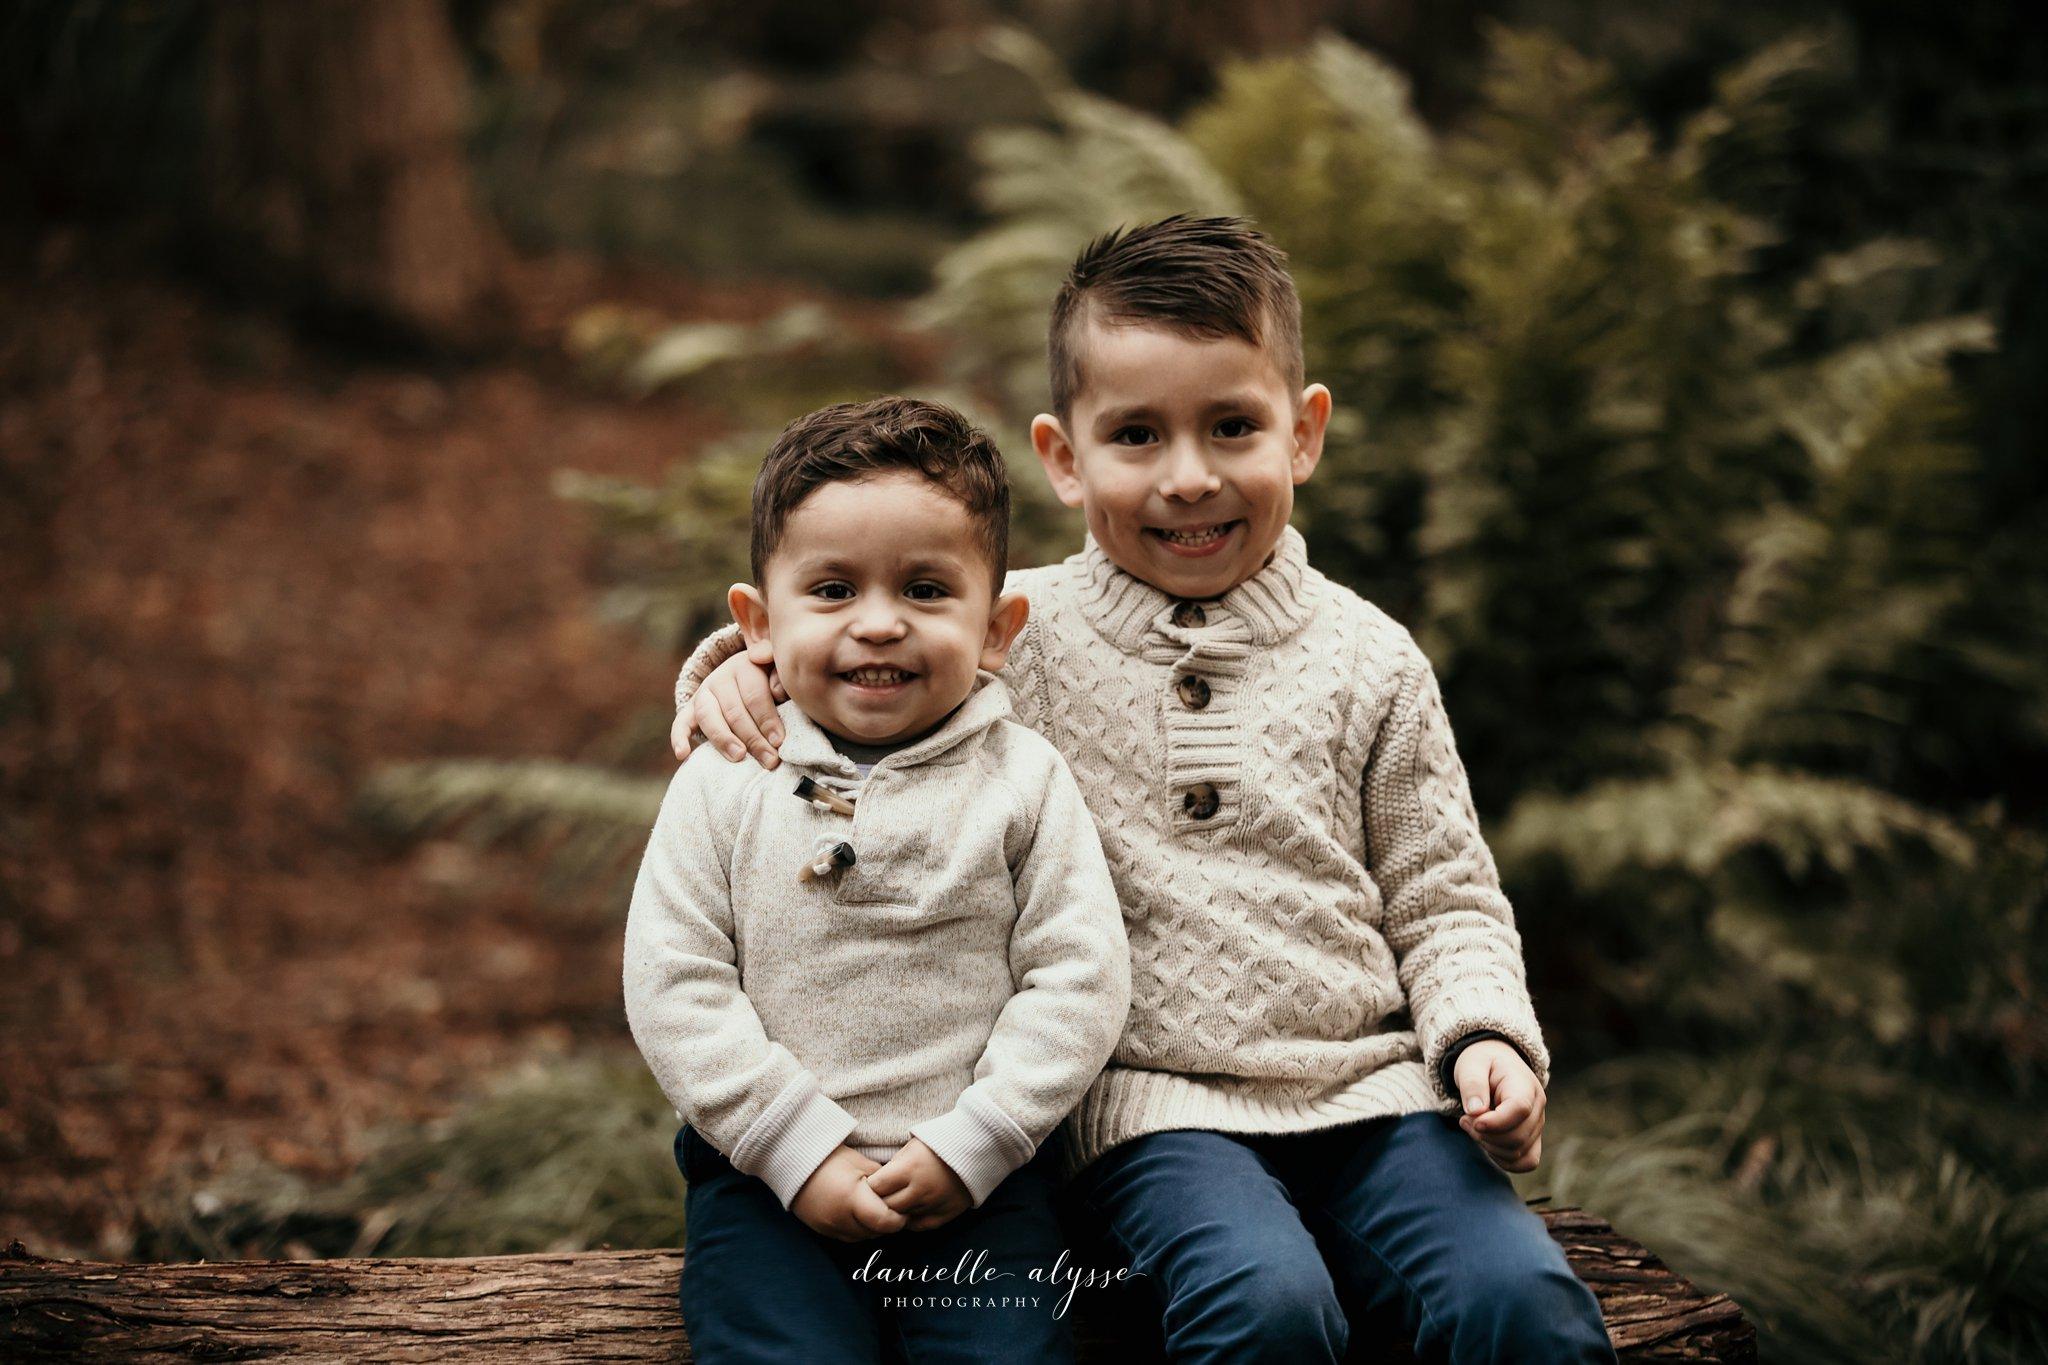 181205_family_portrait_fall_davis_arboretum_andrea_danielle_alysse_photography_7_WEB.jpg